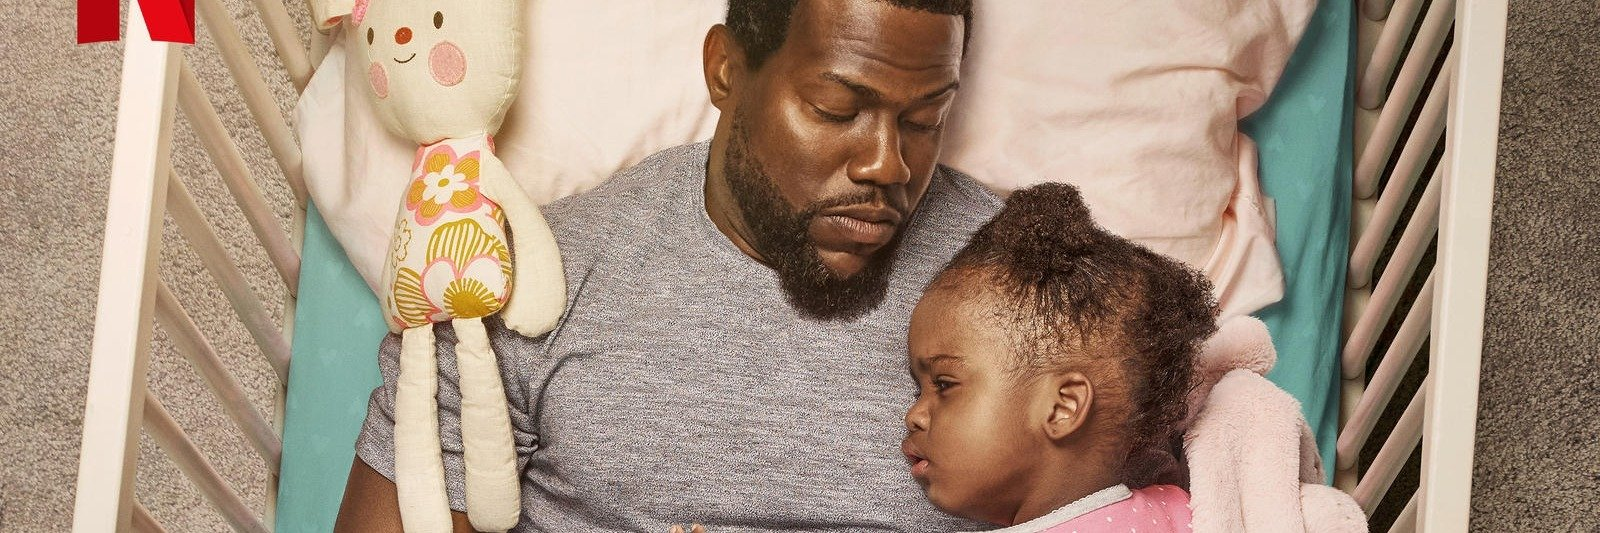 Przedstawiamy: Fatherhood (Original Motion Picture Soundtrack)